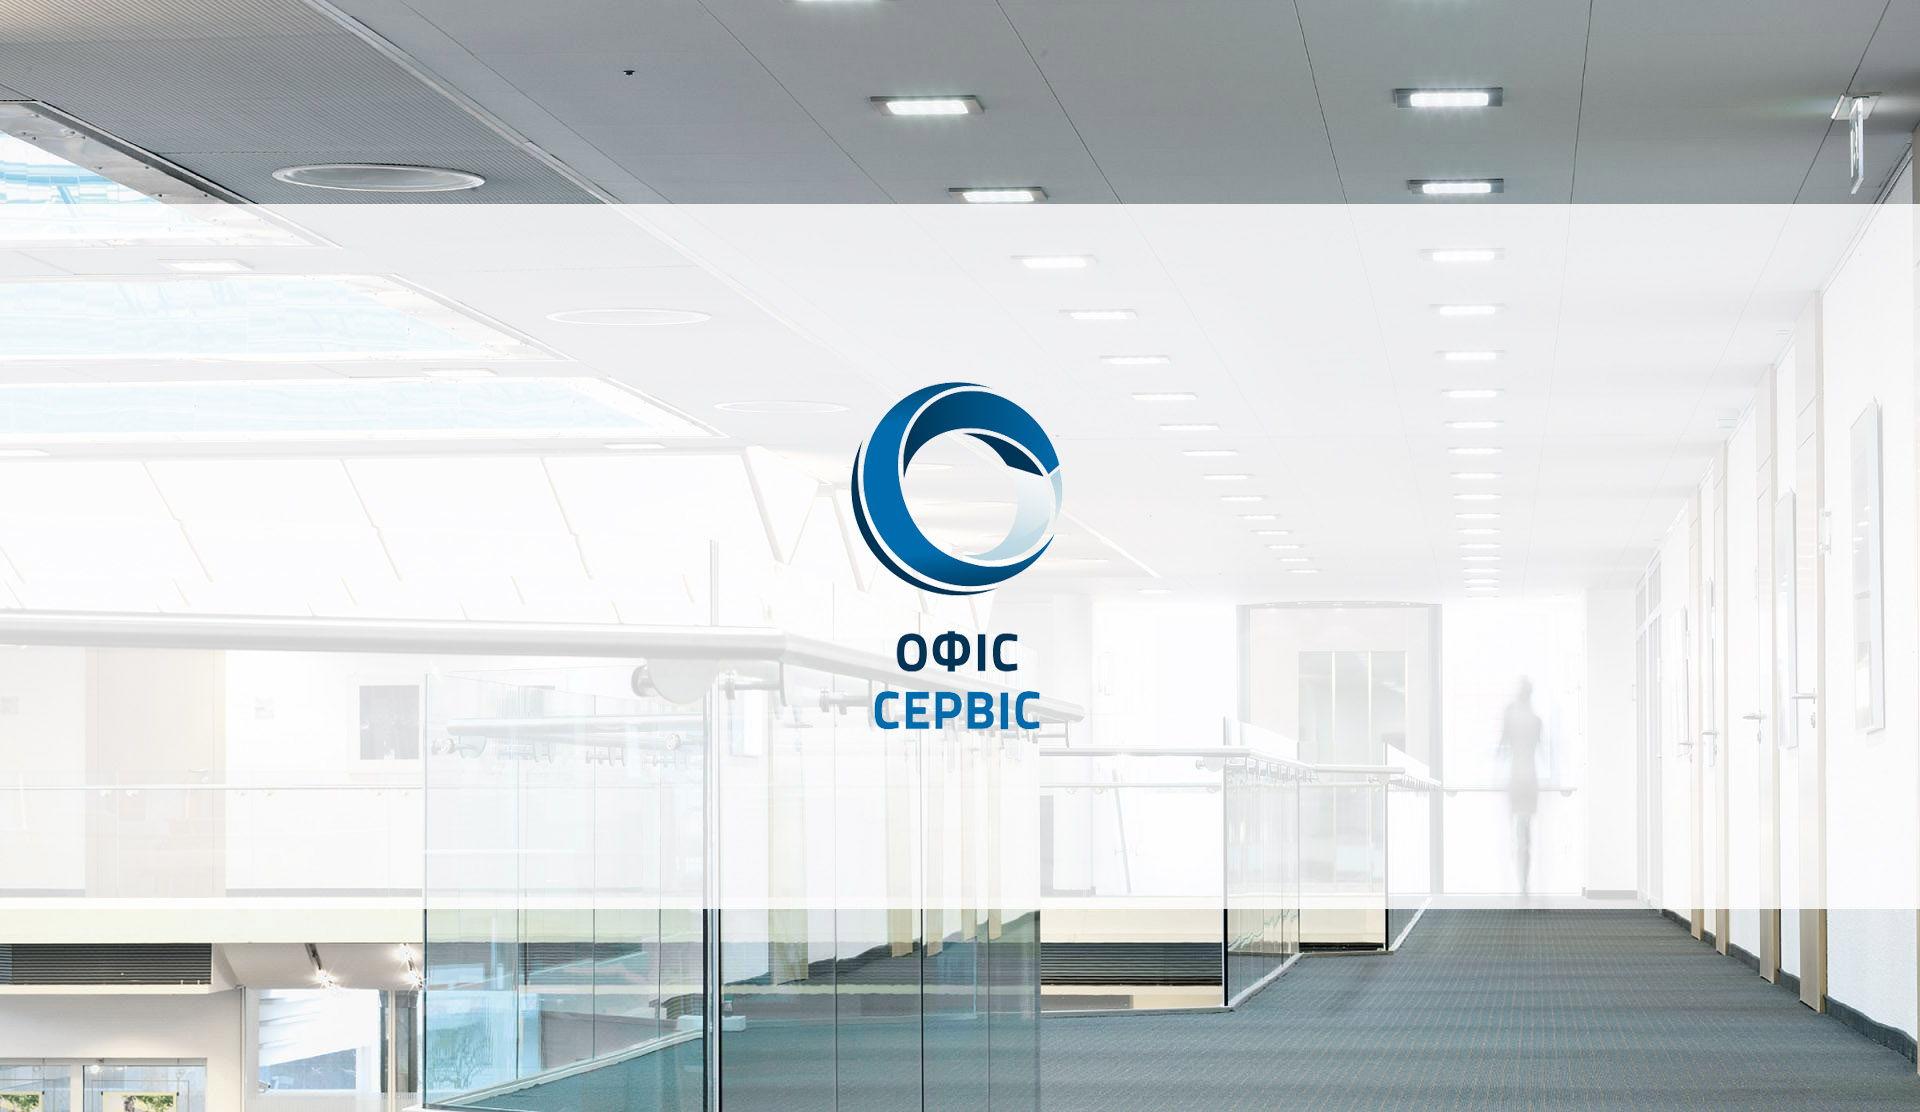 Дизайн логотипа of a financial company, Finance company logo design